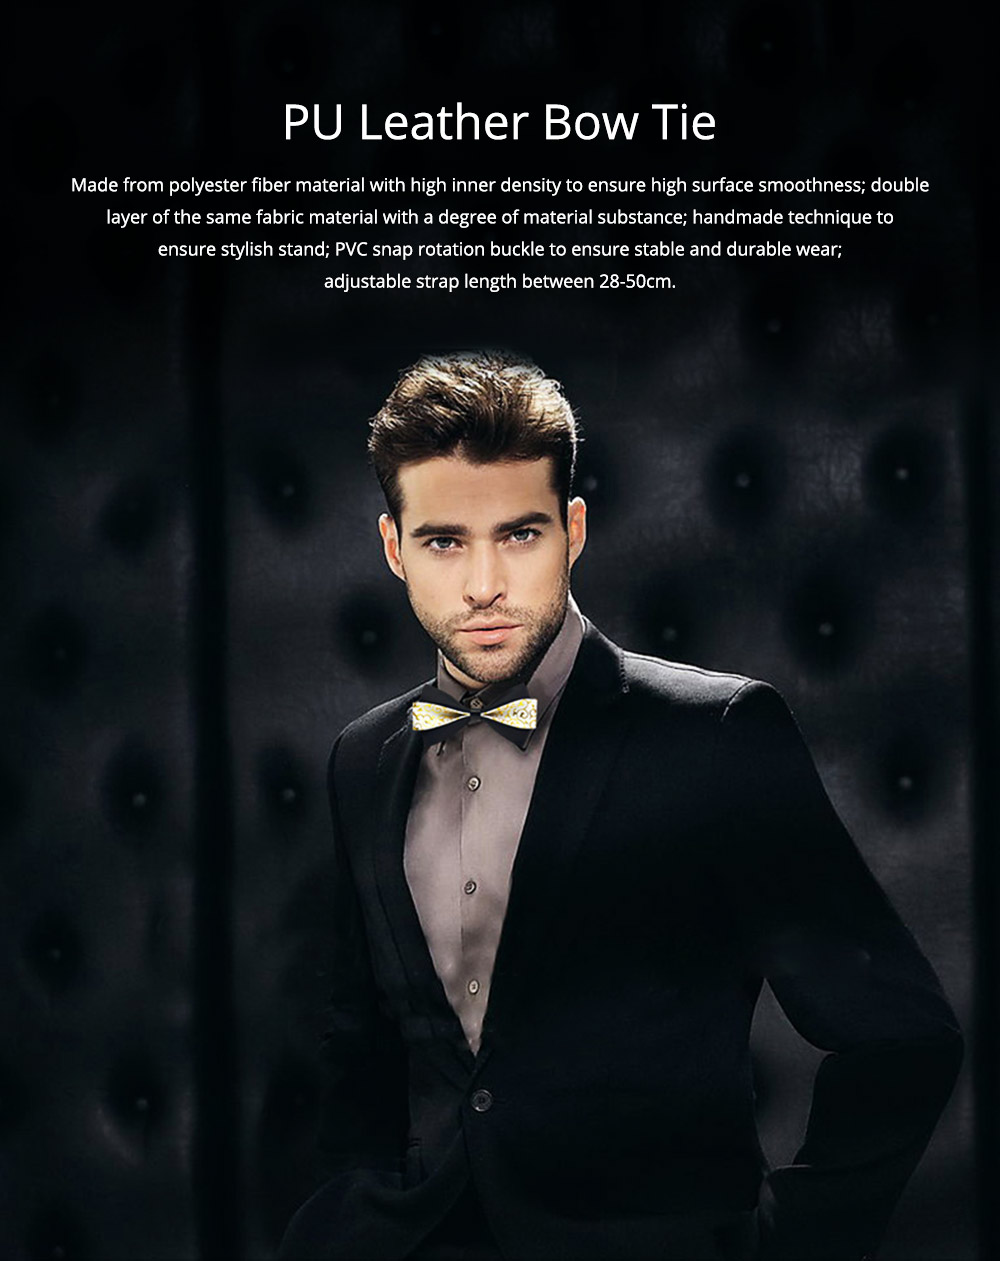 Bow Tie of PU Leather for Wedding Business Suit Bow Tie Fashionable British Style Elviro Tie Bridegroom Groomsman Used Bow Tie 0